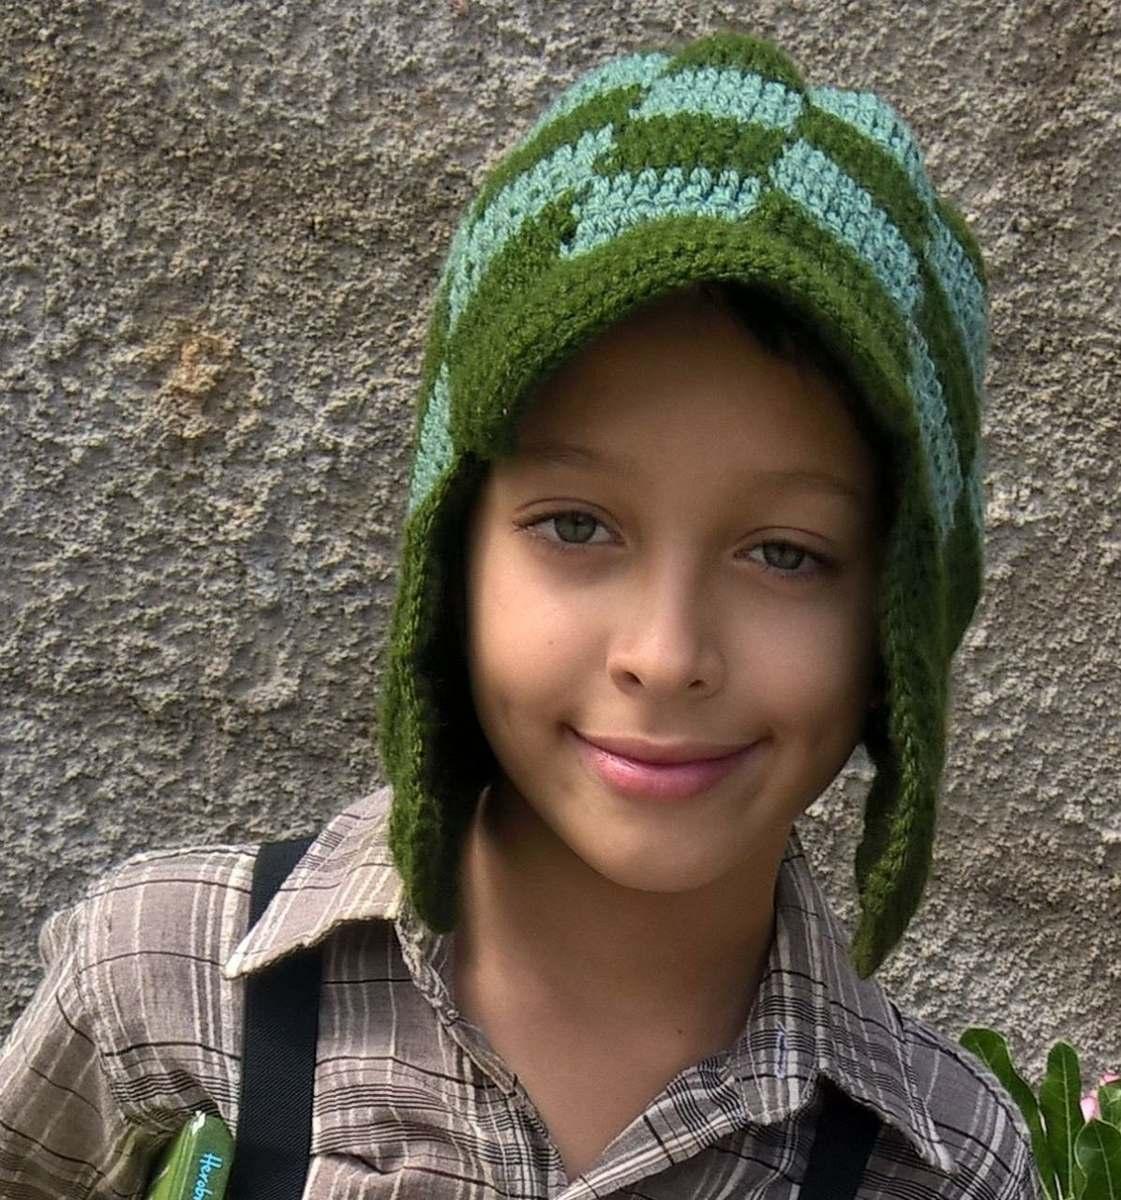 touca chaves croche gorro boina chapeu bone frete gratis. Carregando zoom. 0f0417ac3b7